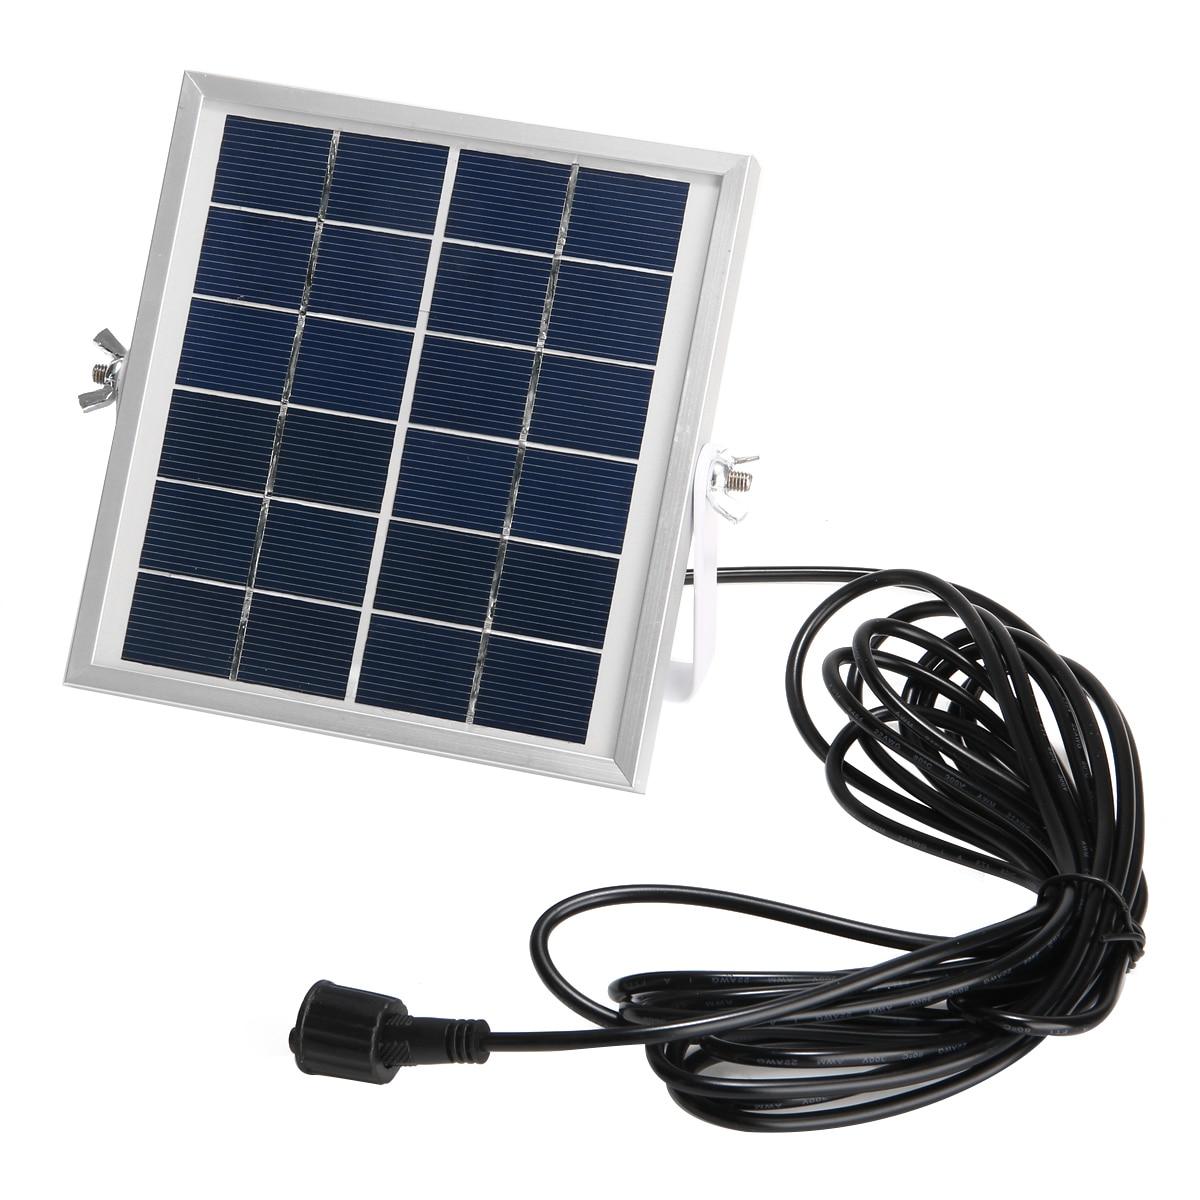 Lâmpada solar ao ar livre 10 w